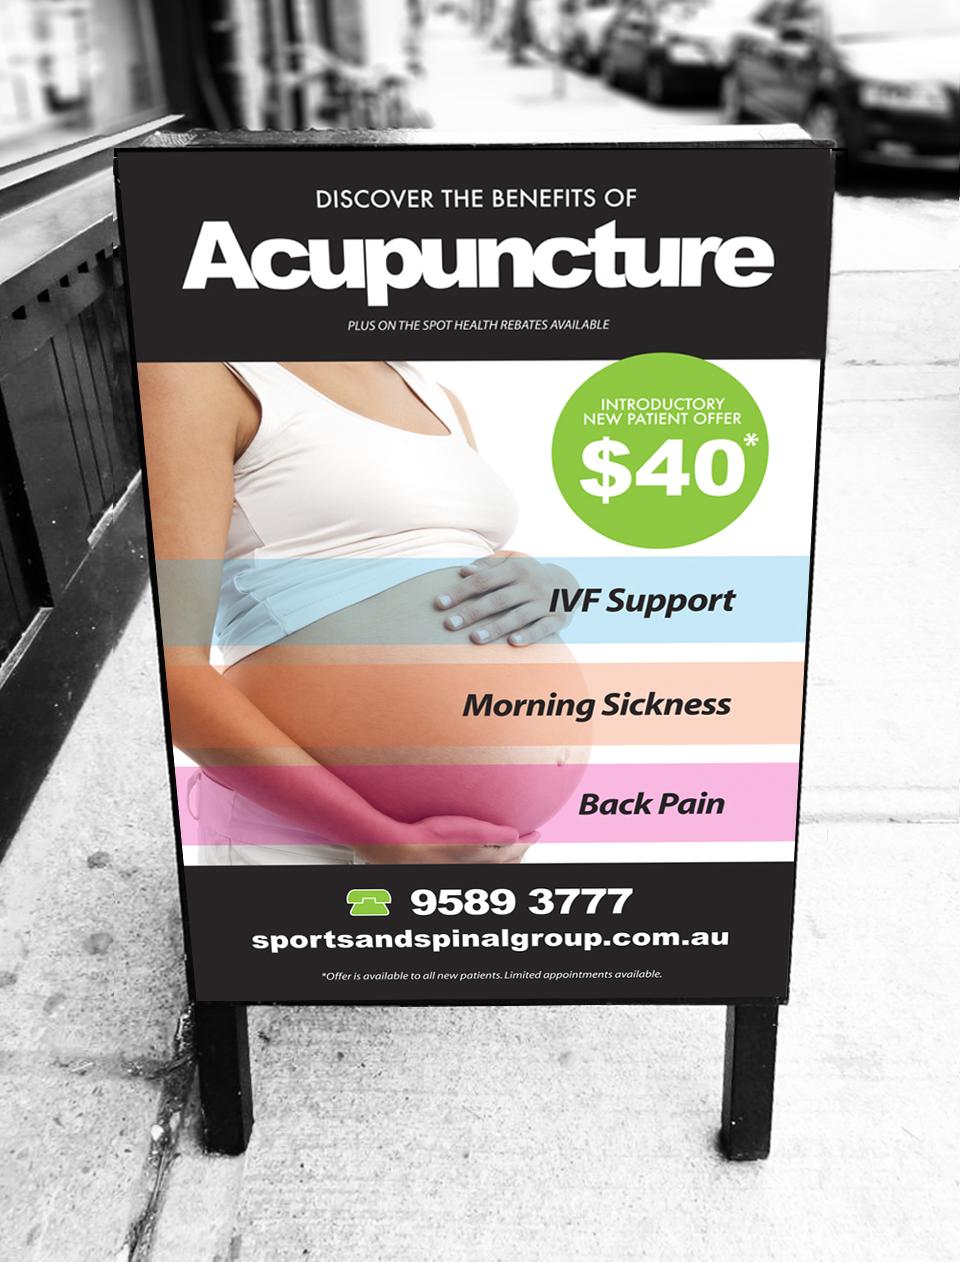 SSG_acupuncture_sign_design.png